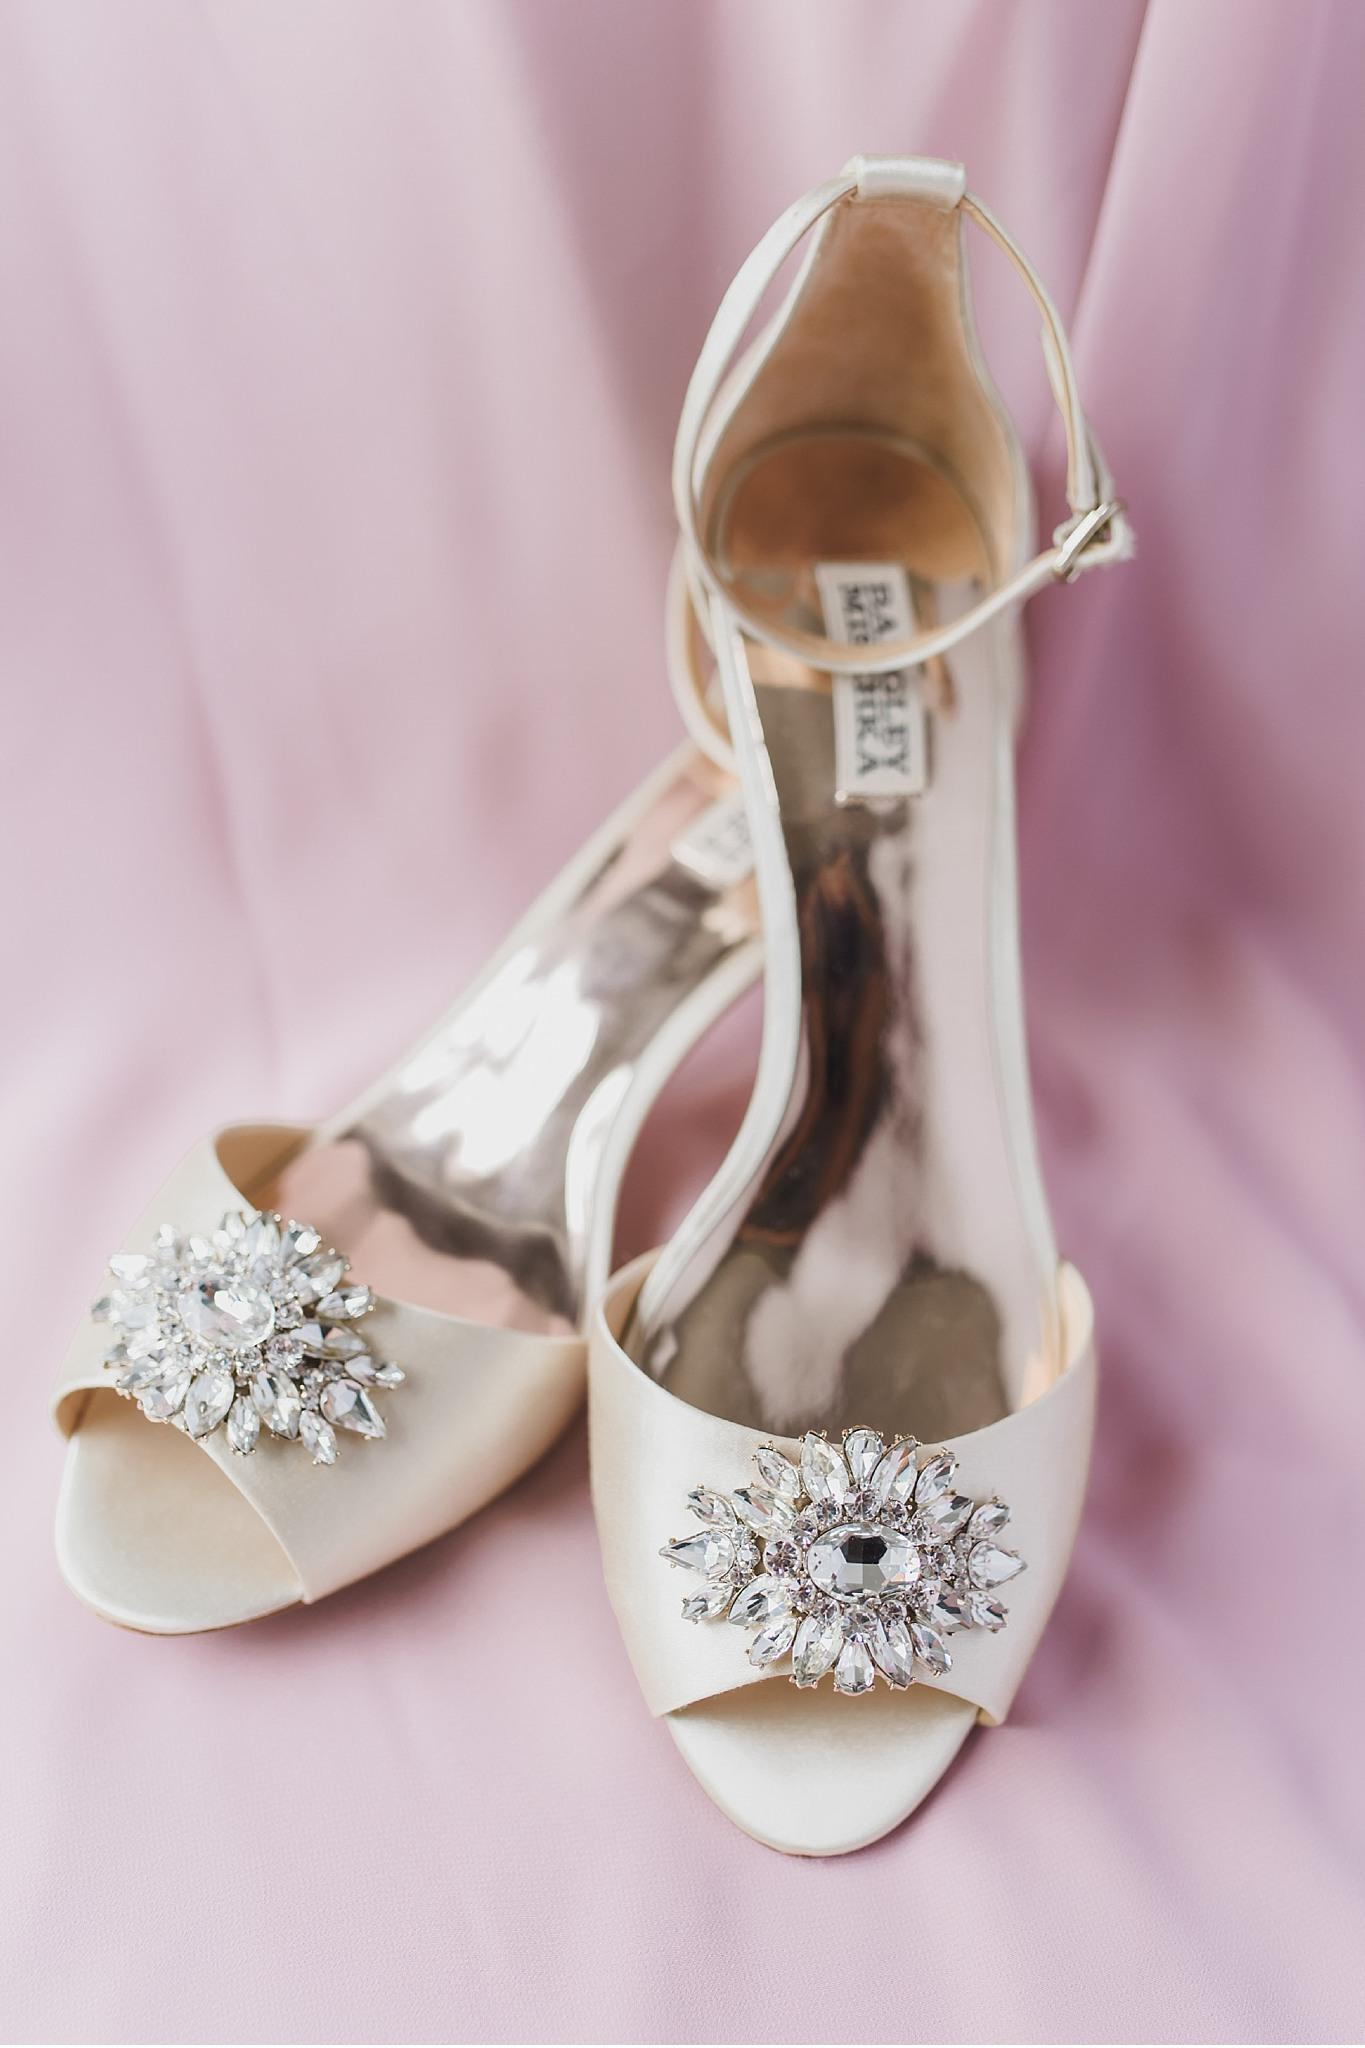 Badgley Mishchka  shoes Hershey Gardens Hershey Country Club Summer beautiful wedding photography_1540.jpg